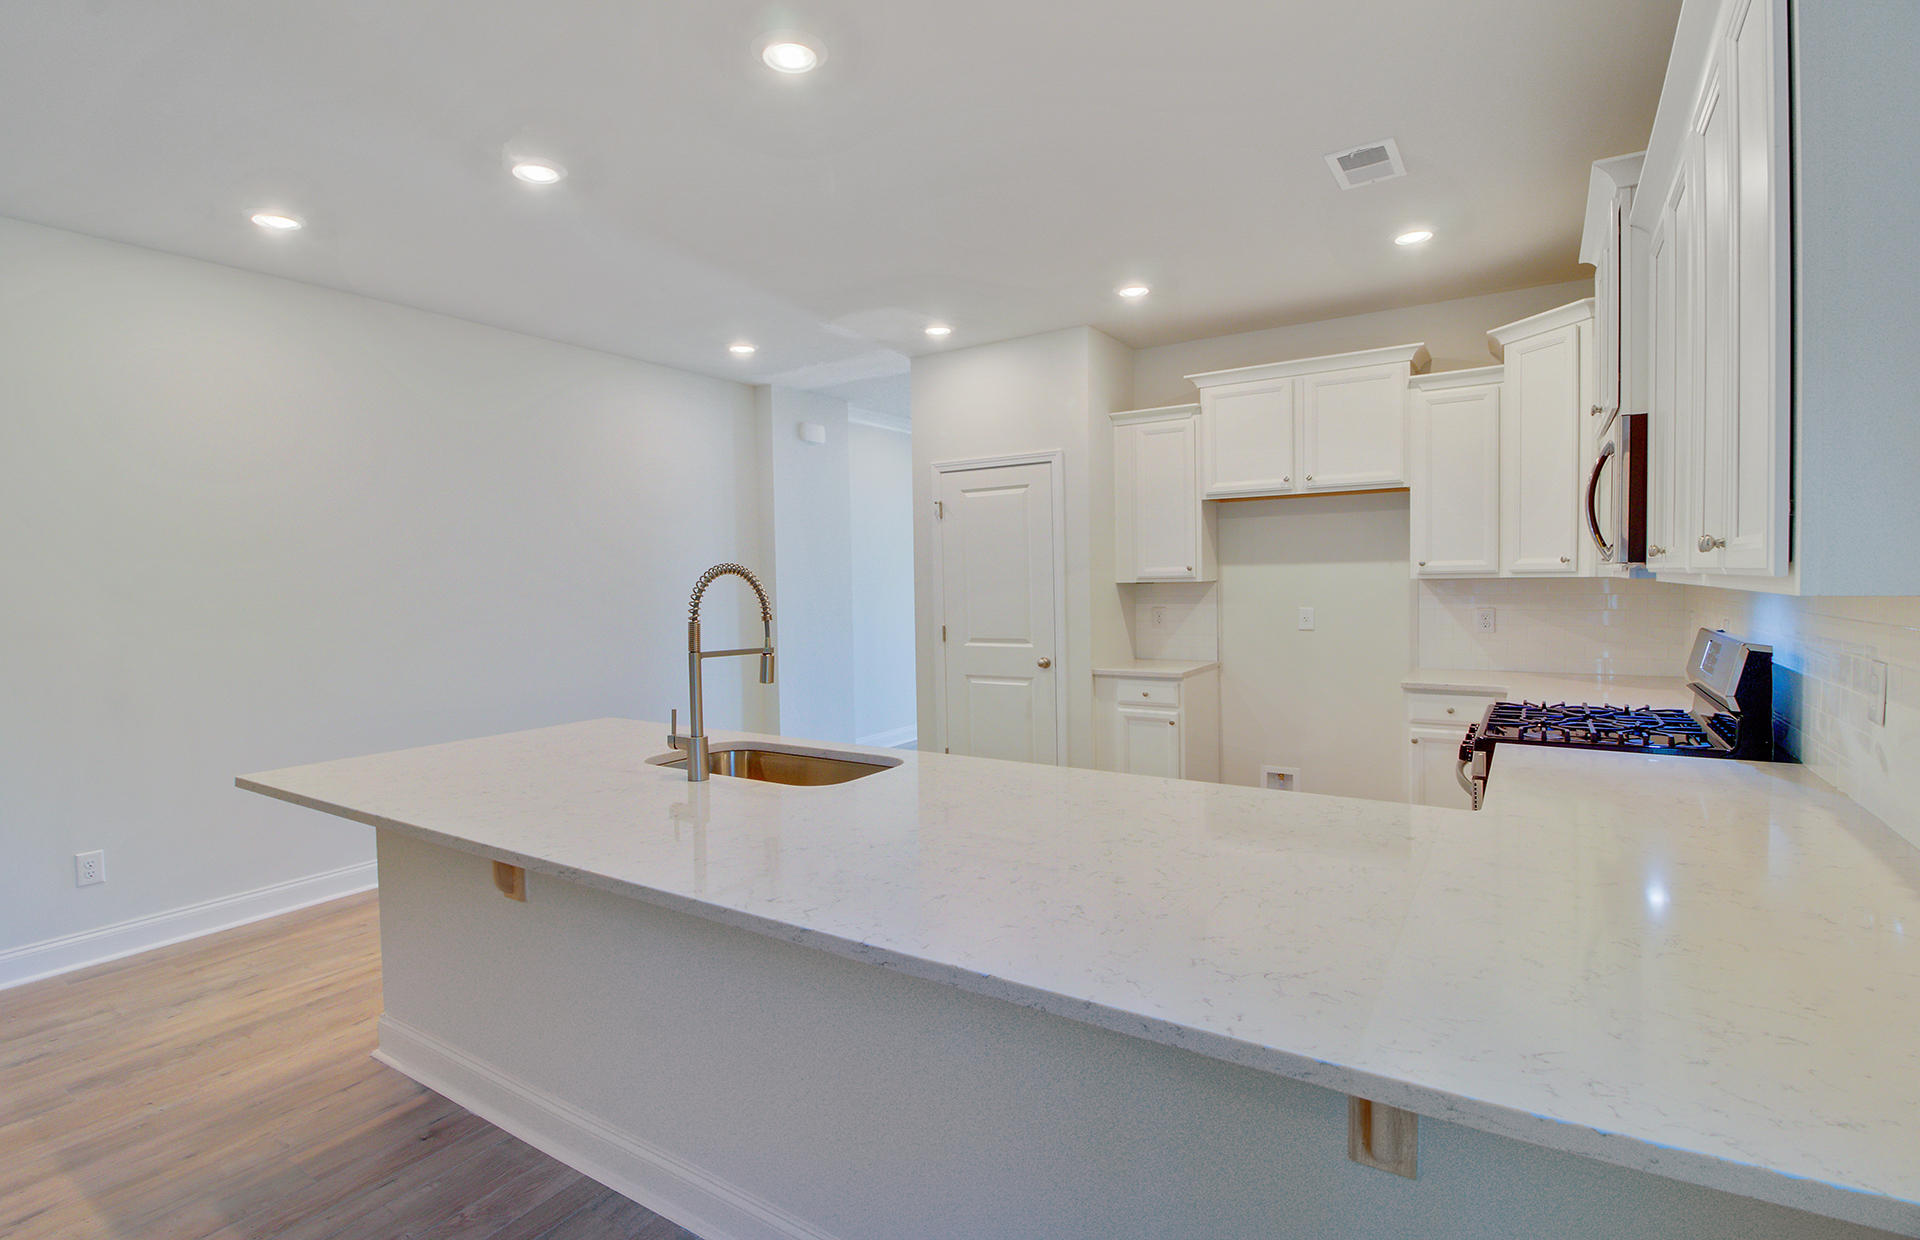 Park West Homes For Sale - 3030 Rice Field, Mount Pleasant, SC - 23